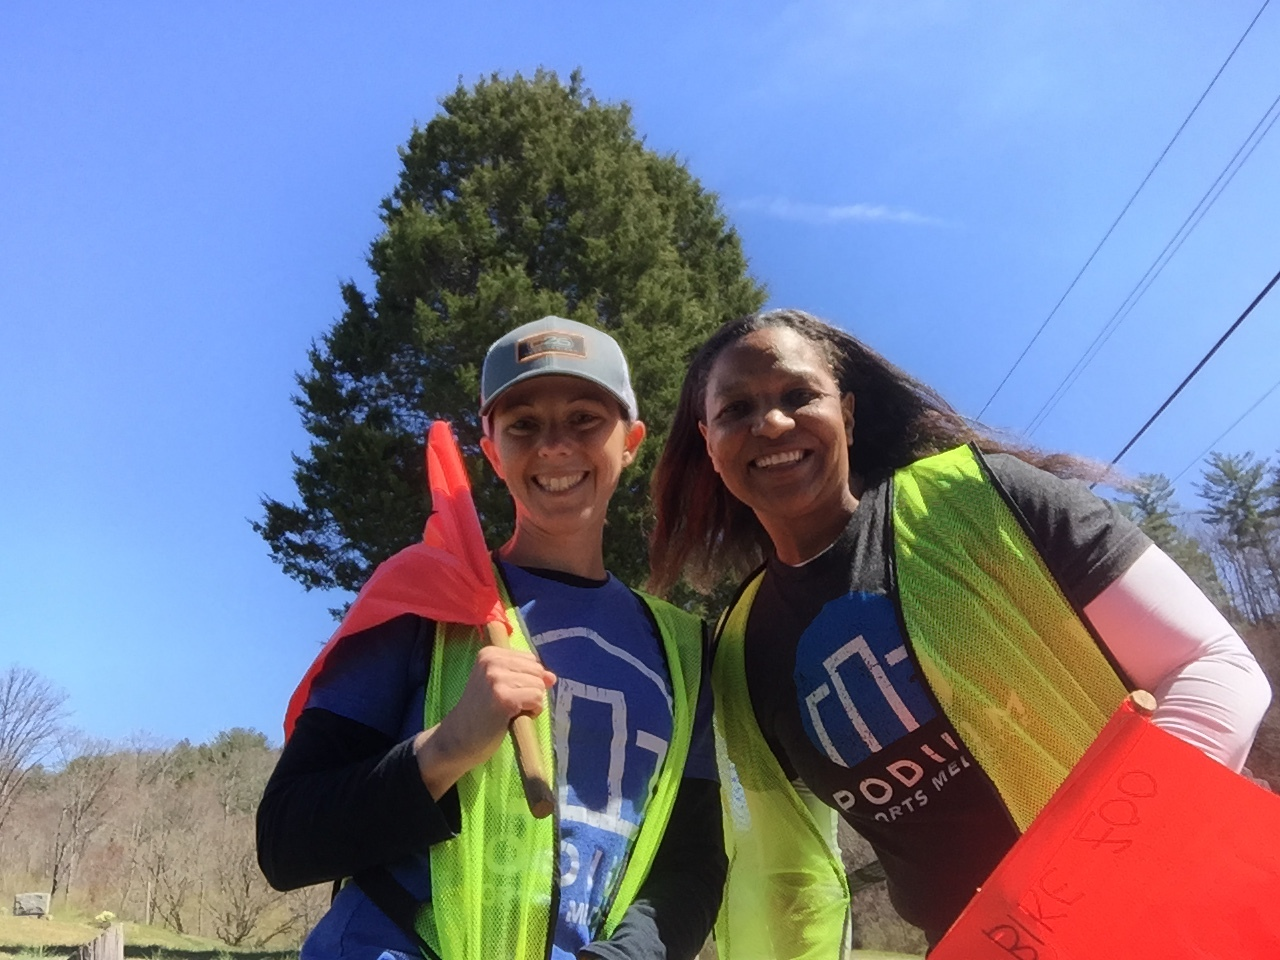 Shameka and Renee out volunteering at the Oak Ridge Velo Classic